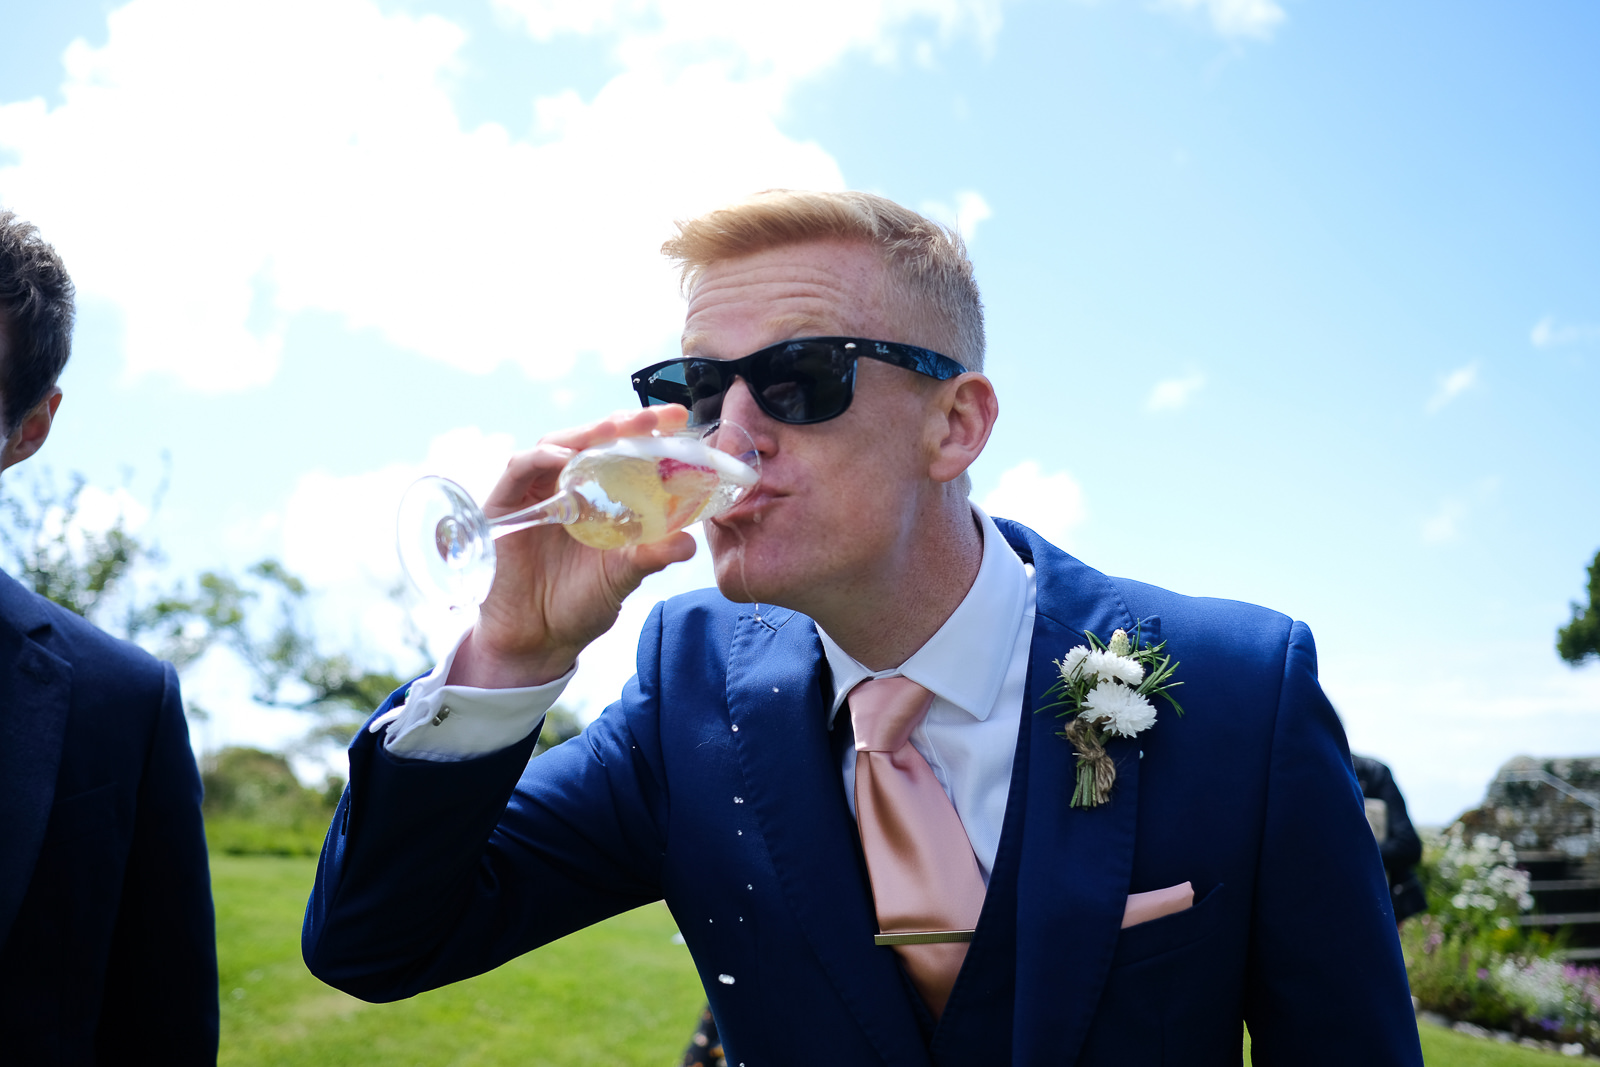 Roscarrock Farm wedding in Cornwall 045.jpg